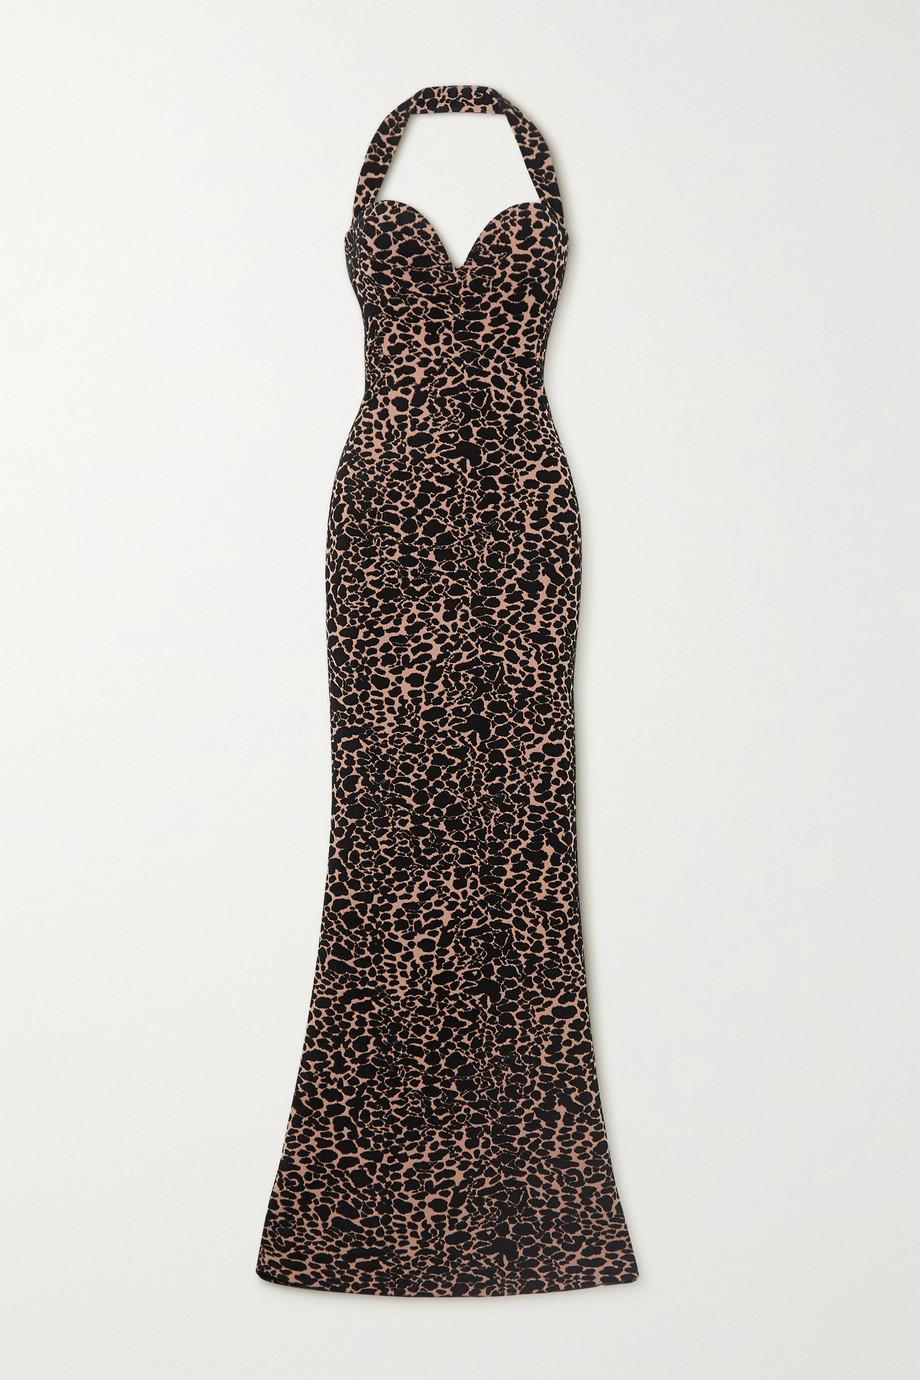 Alaïa Leopard jacquard-knit halterneck gown